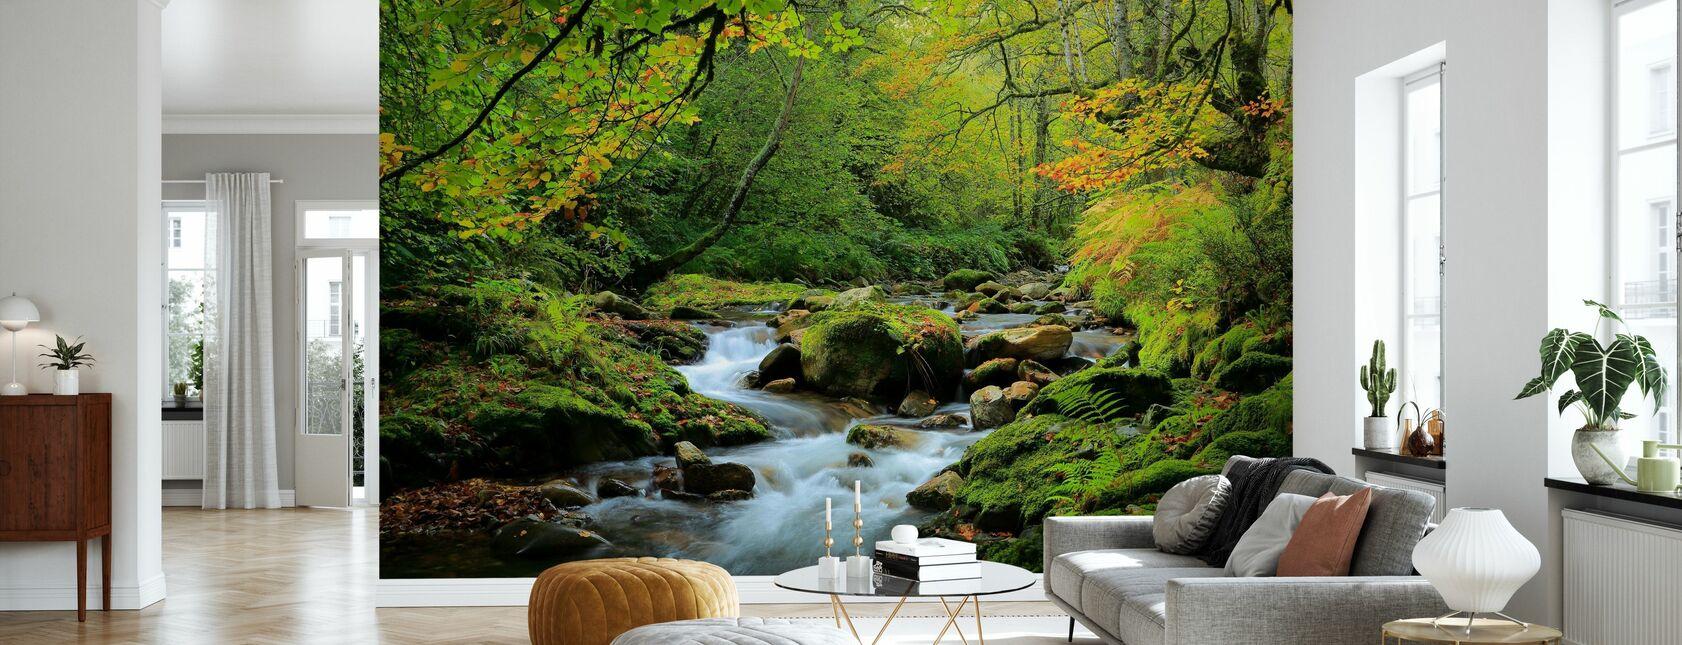 Flod och bokskog - Tapet - Vardagsrum